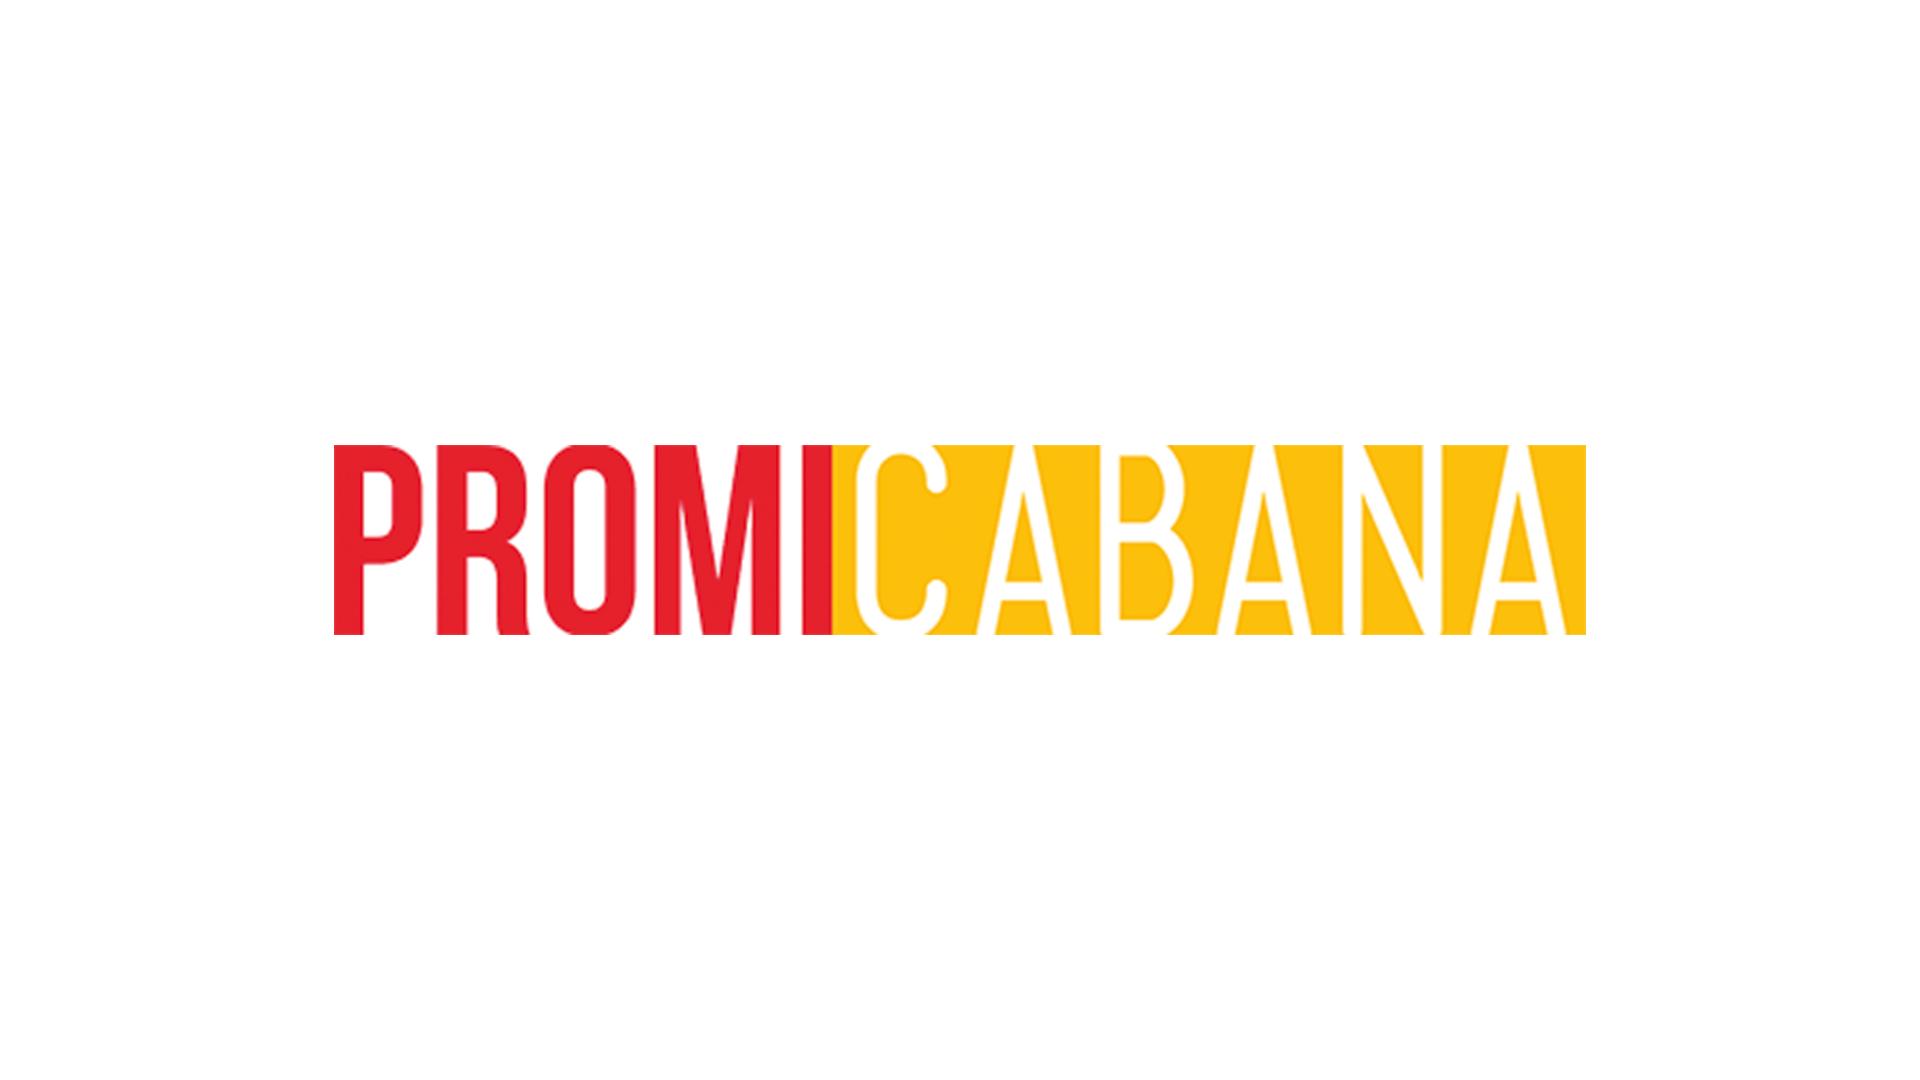 Dschungelcamp-Brigitte-Rocco-Kim-Micaela